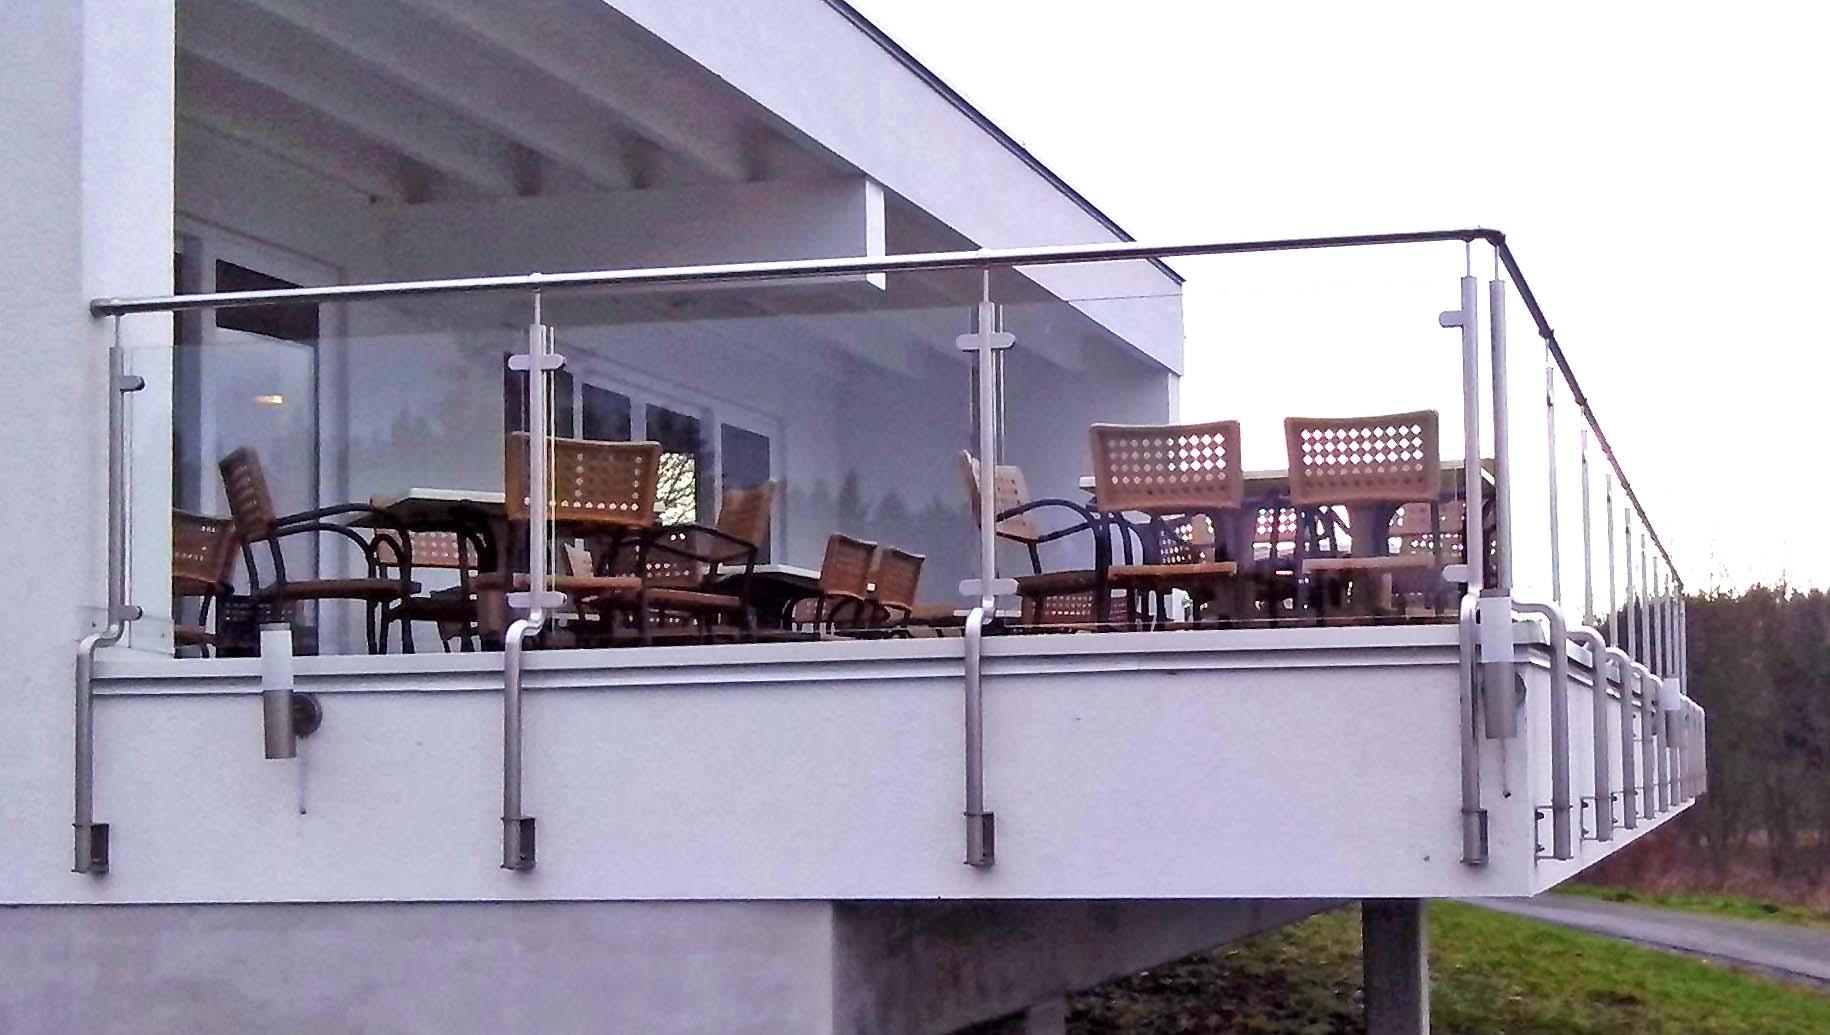 Edelstahlgeländer - Gasthaus Talsperre Zeulenroda